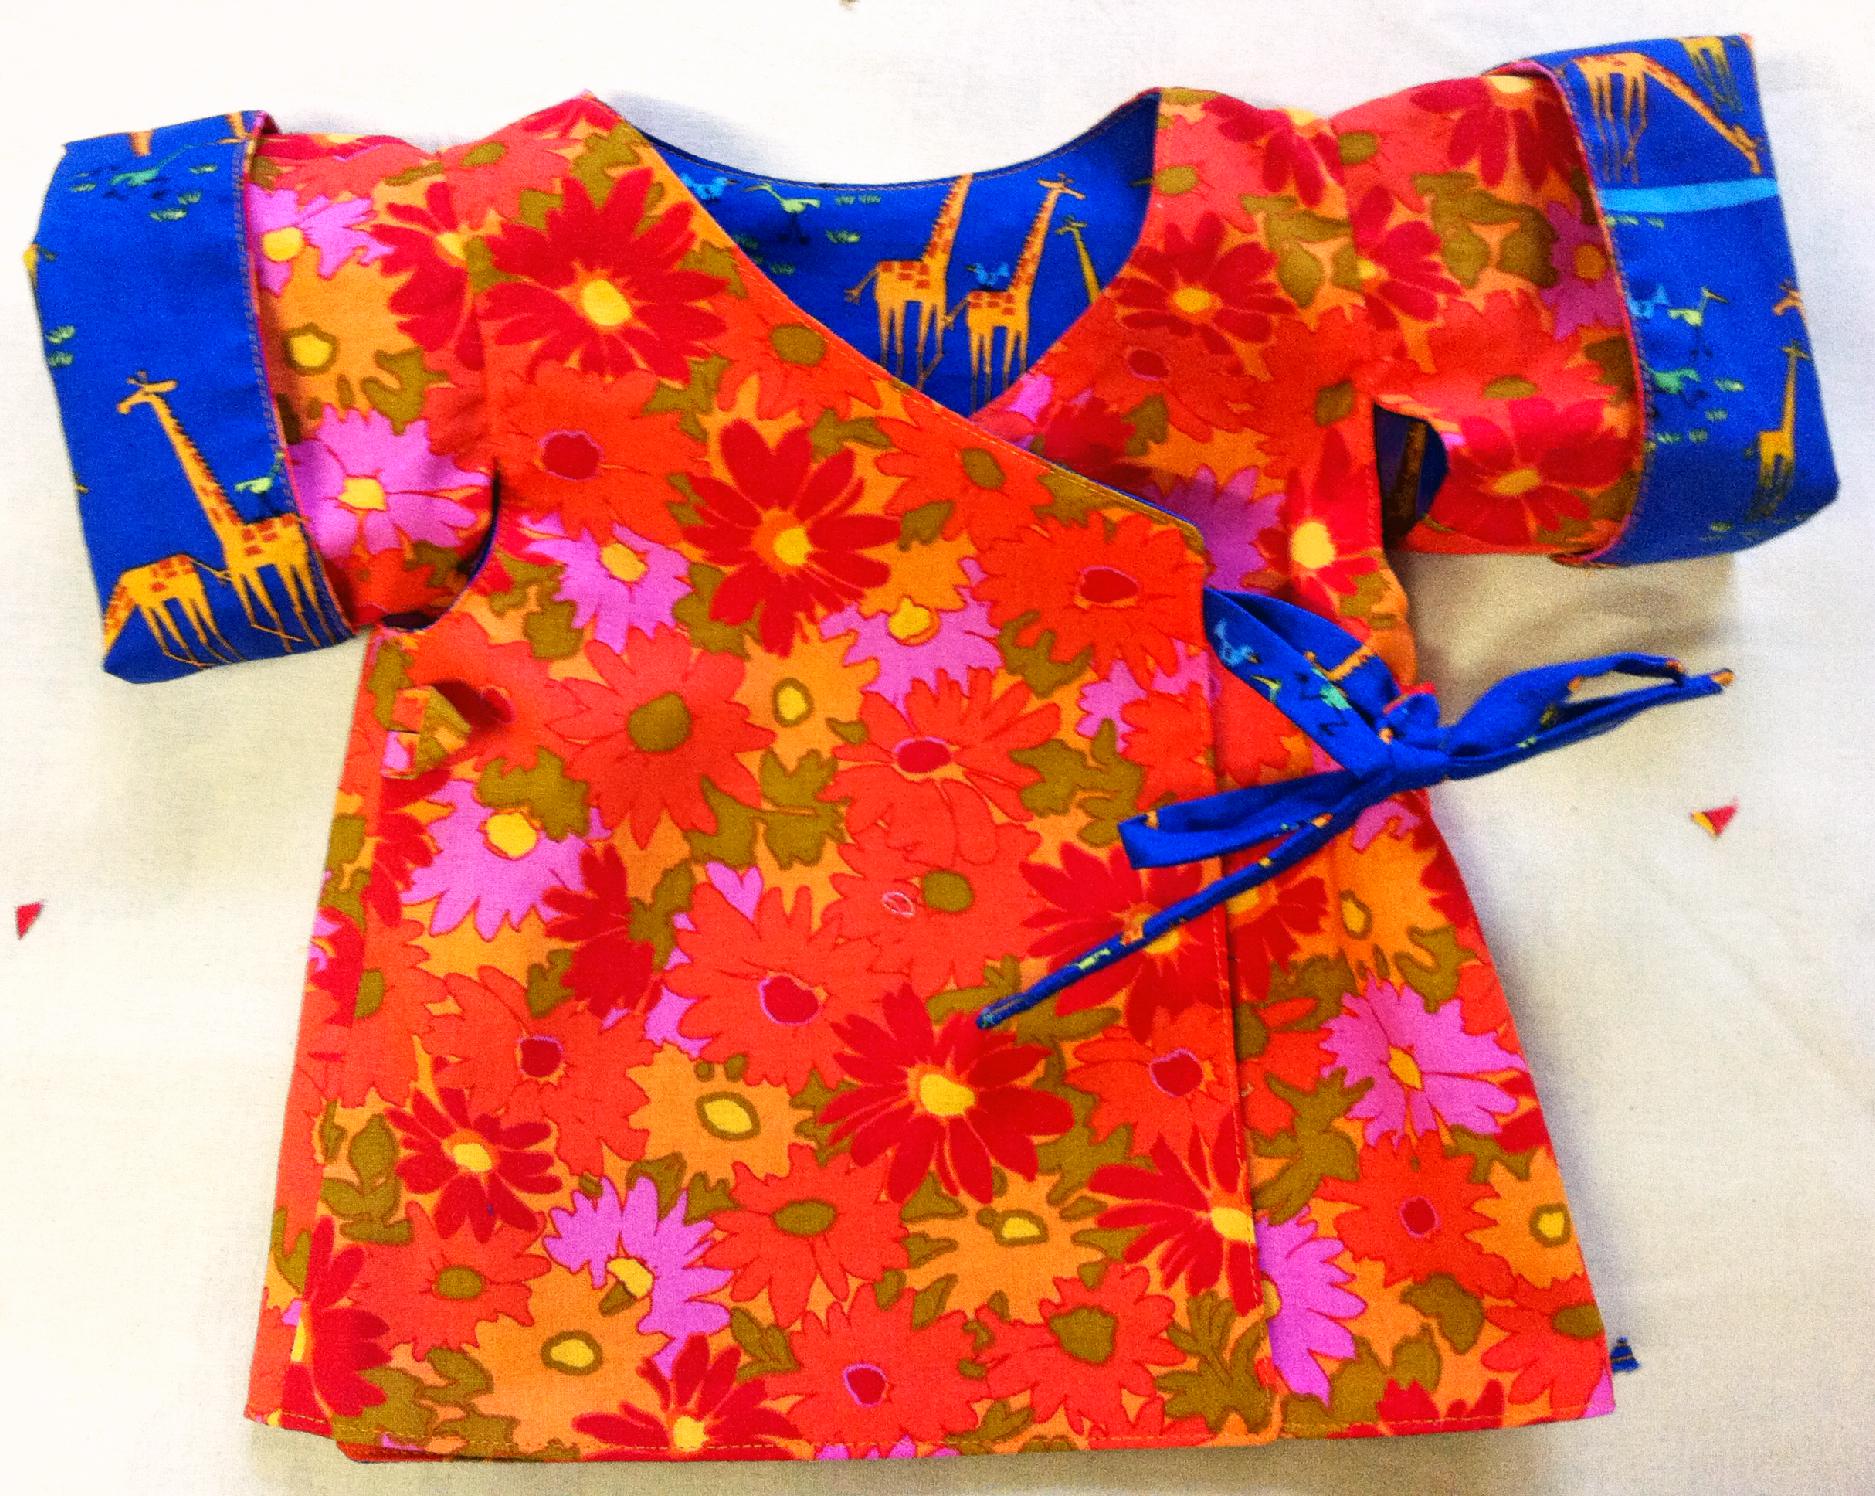 erna und gustav Cloud9Fabric Giraffe Safari Kimono Bluse